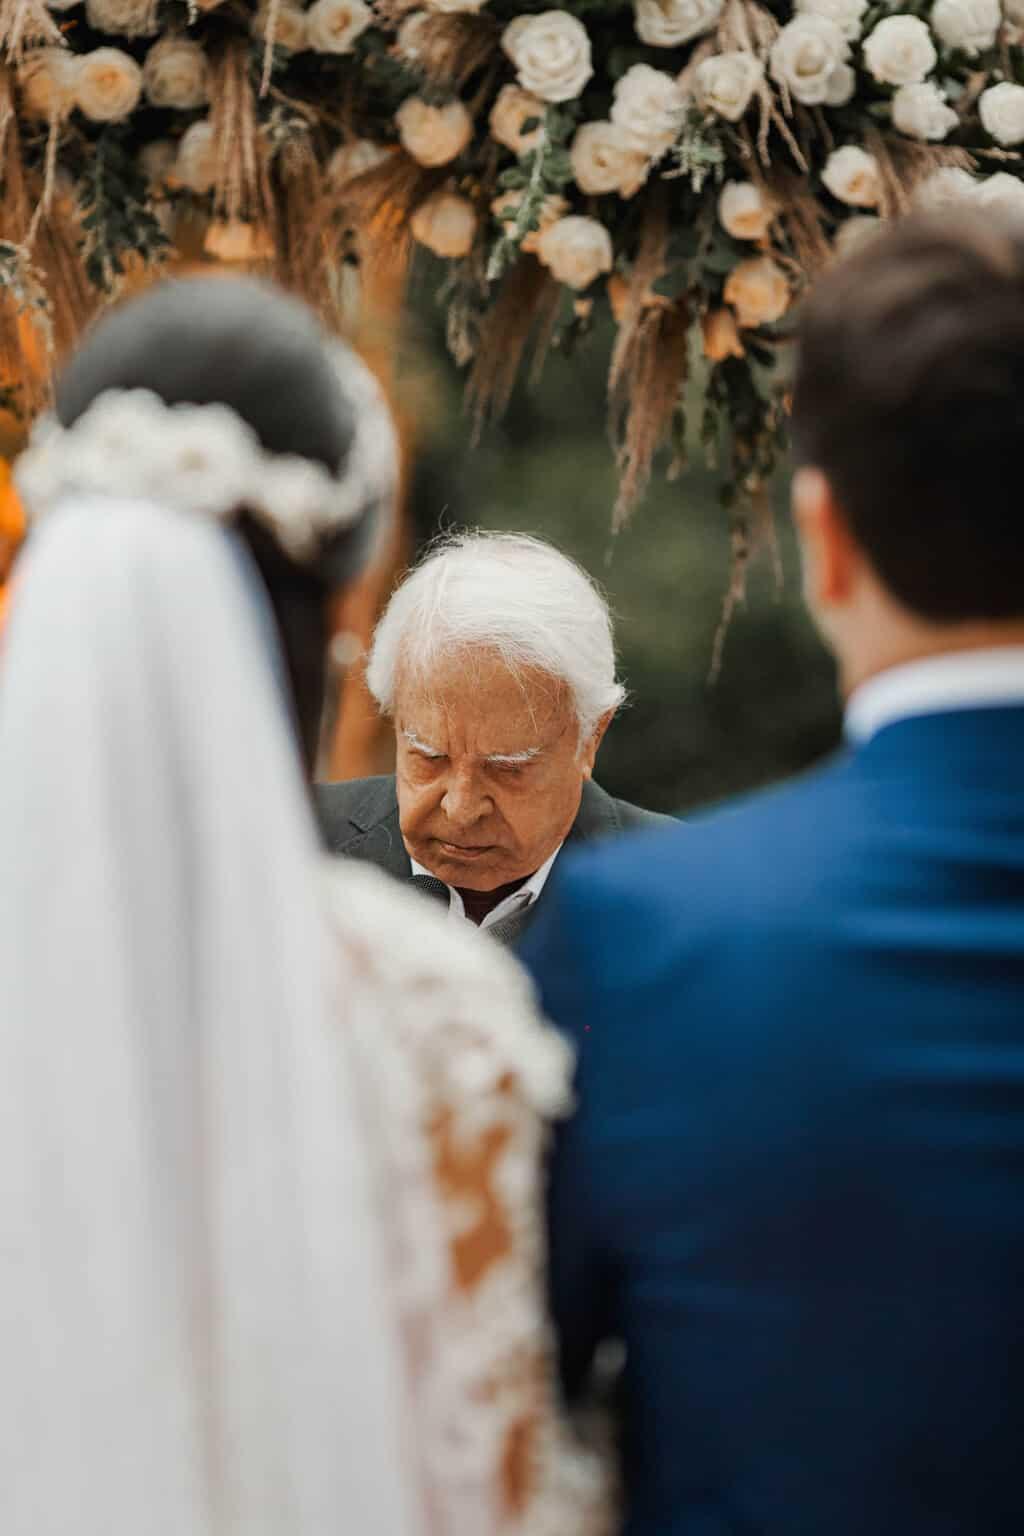 casamento-Beatriz-e-Joao-Fernando-cerimonia-ao-ar-livre-Itaipava-Locanda-Della-Mimosa-Thienny-Tammis144